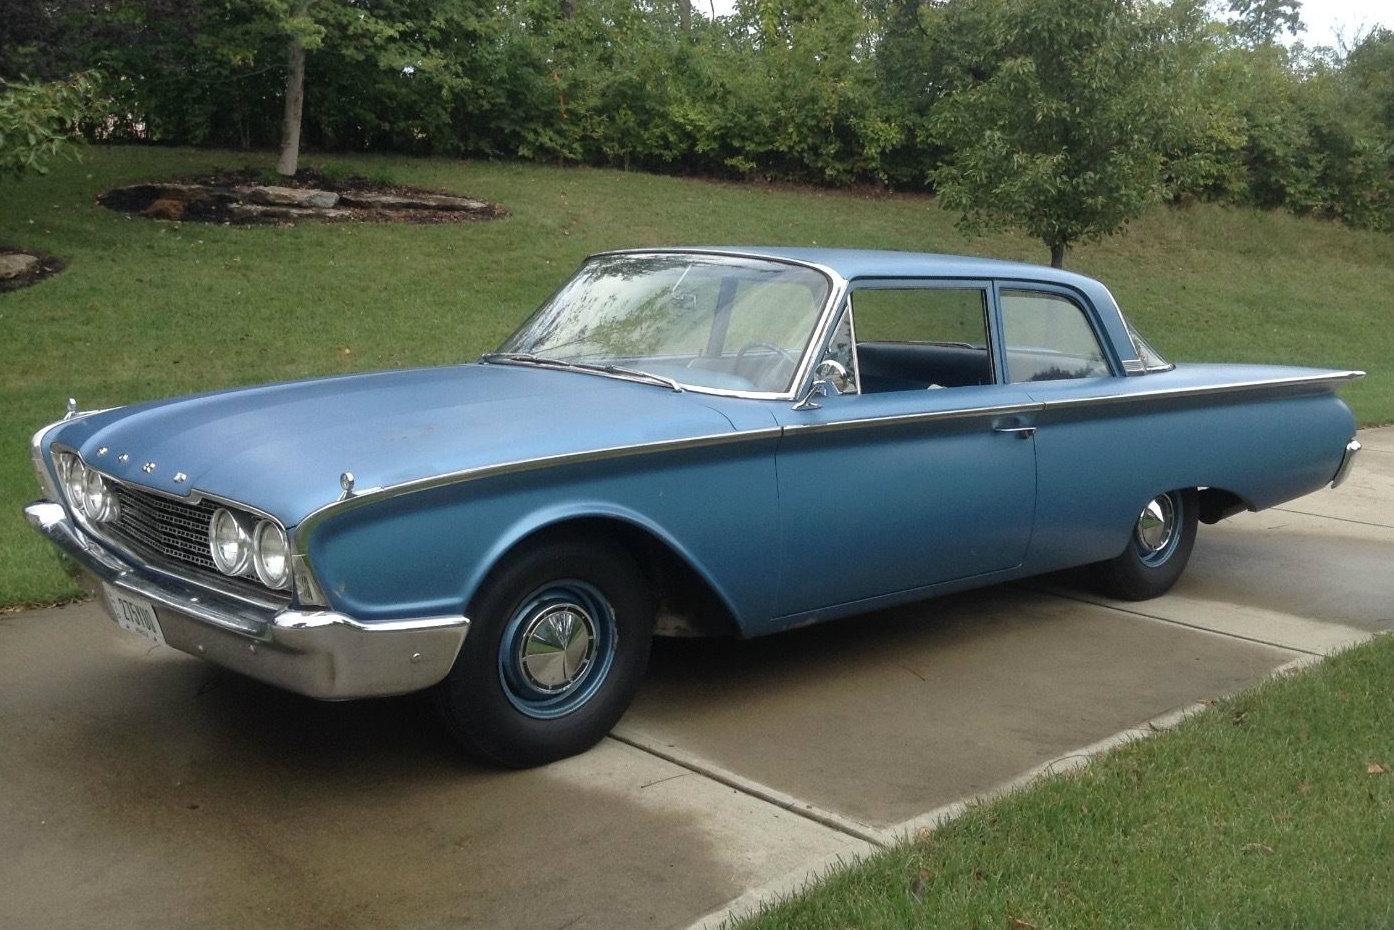 Ohio Super Clean Find 1960 Ford Fairlane